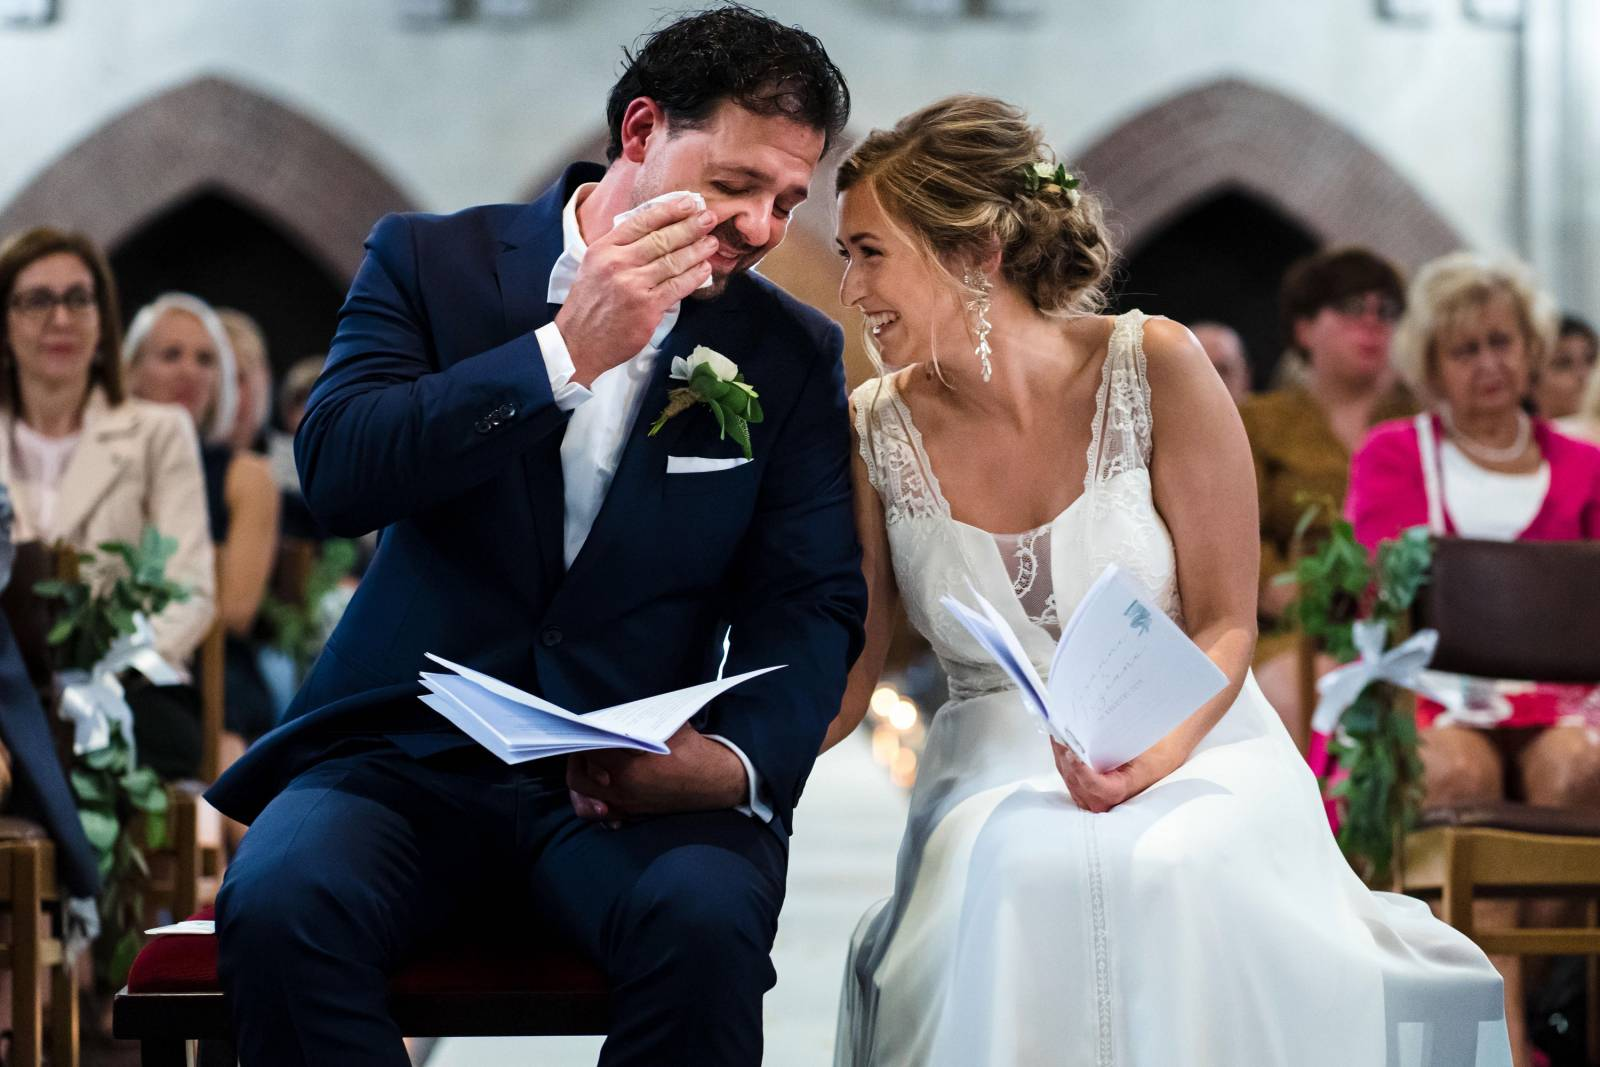 Philippe Swiggers - huwelijksfotograaf - House of Weddings - 5